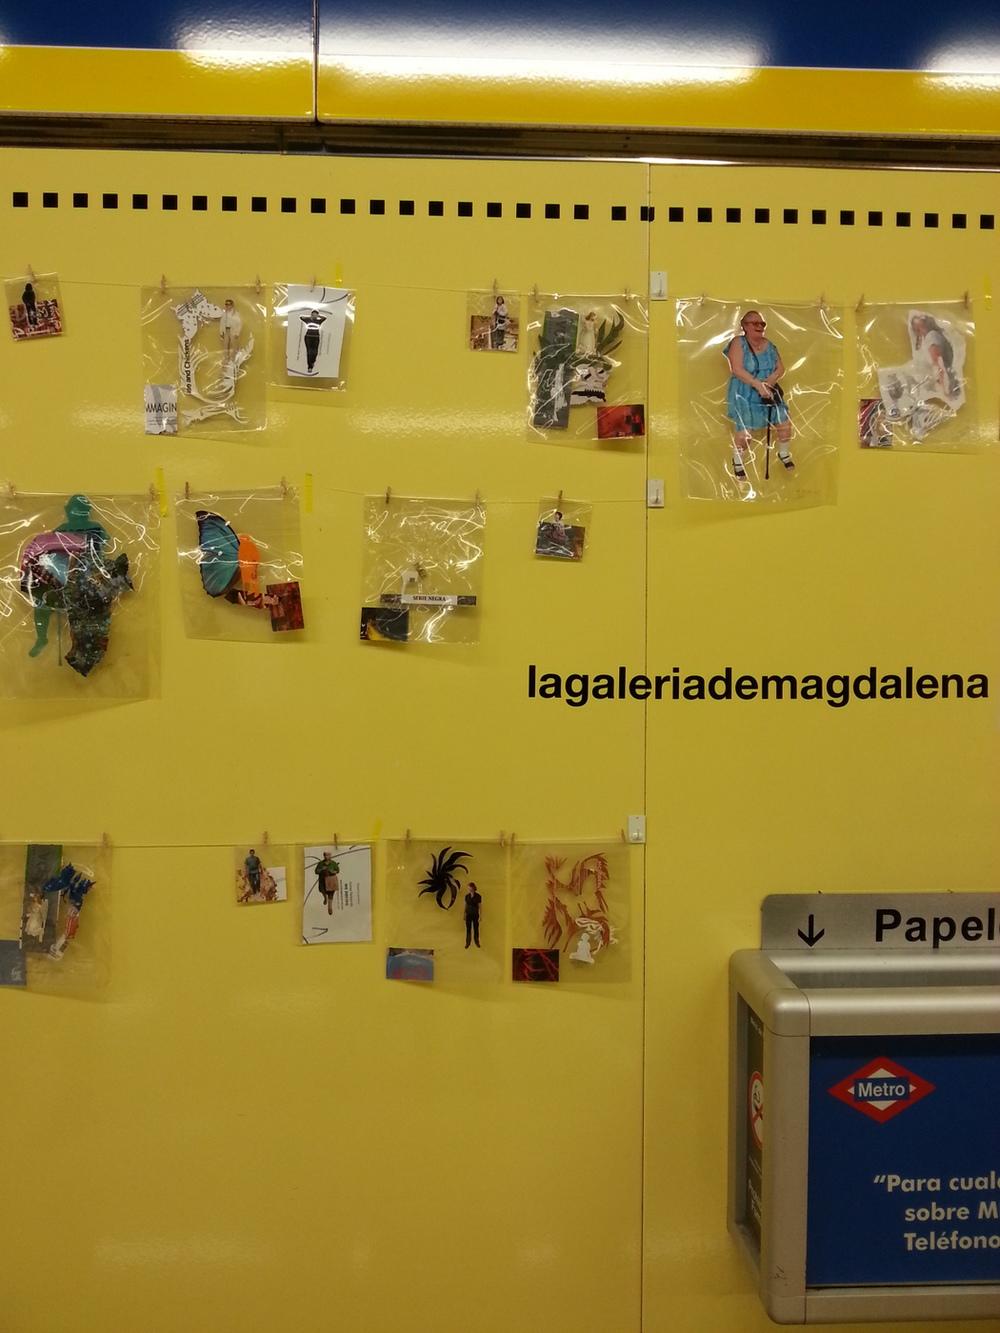 regalossuburbanos_lavapiesII_lagaleriademagdalena-004.JPG